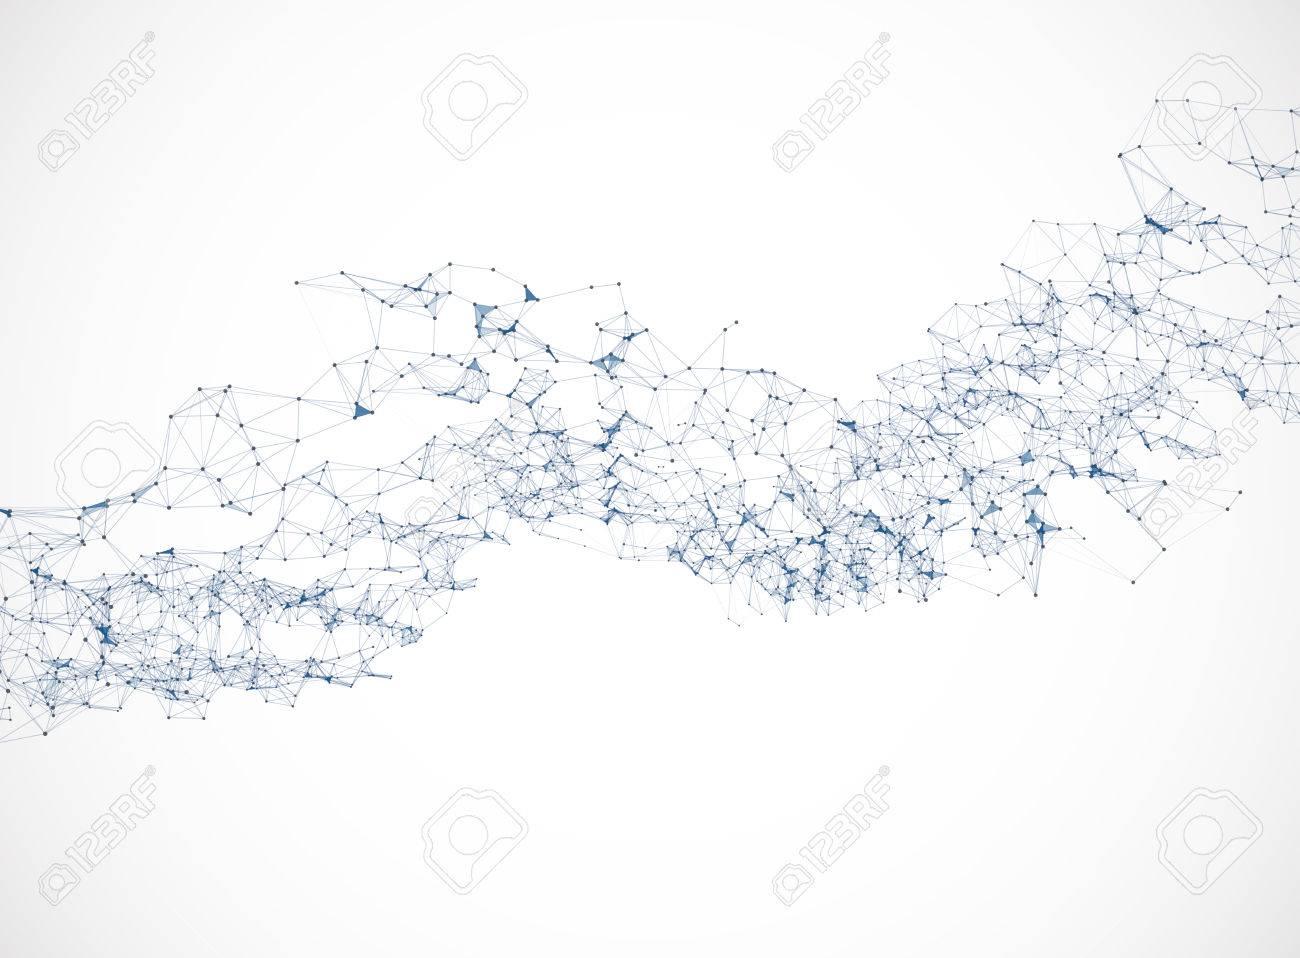 Polygonal background vector illustration science connection design - 51568478